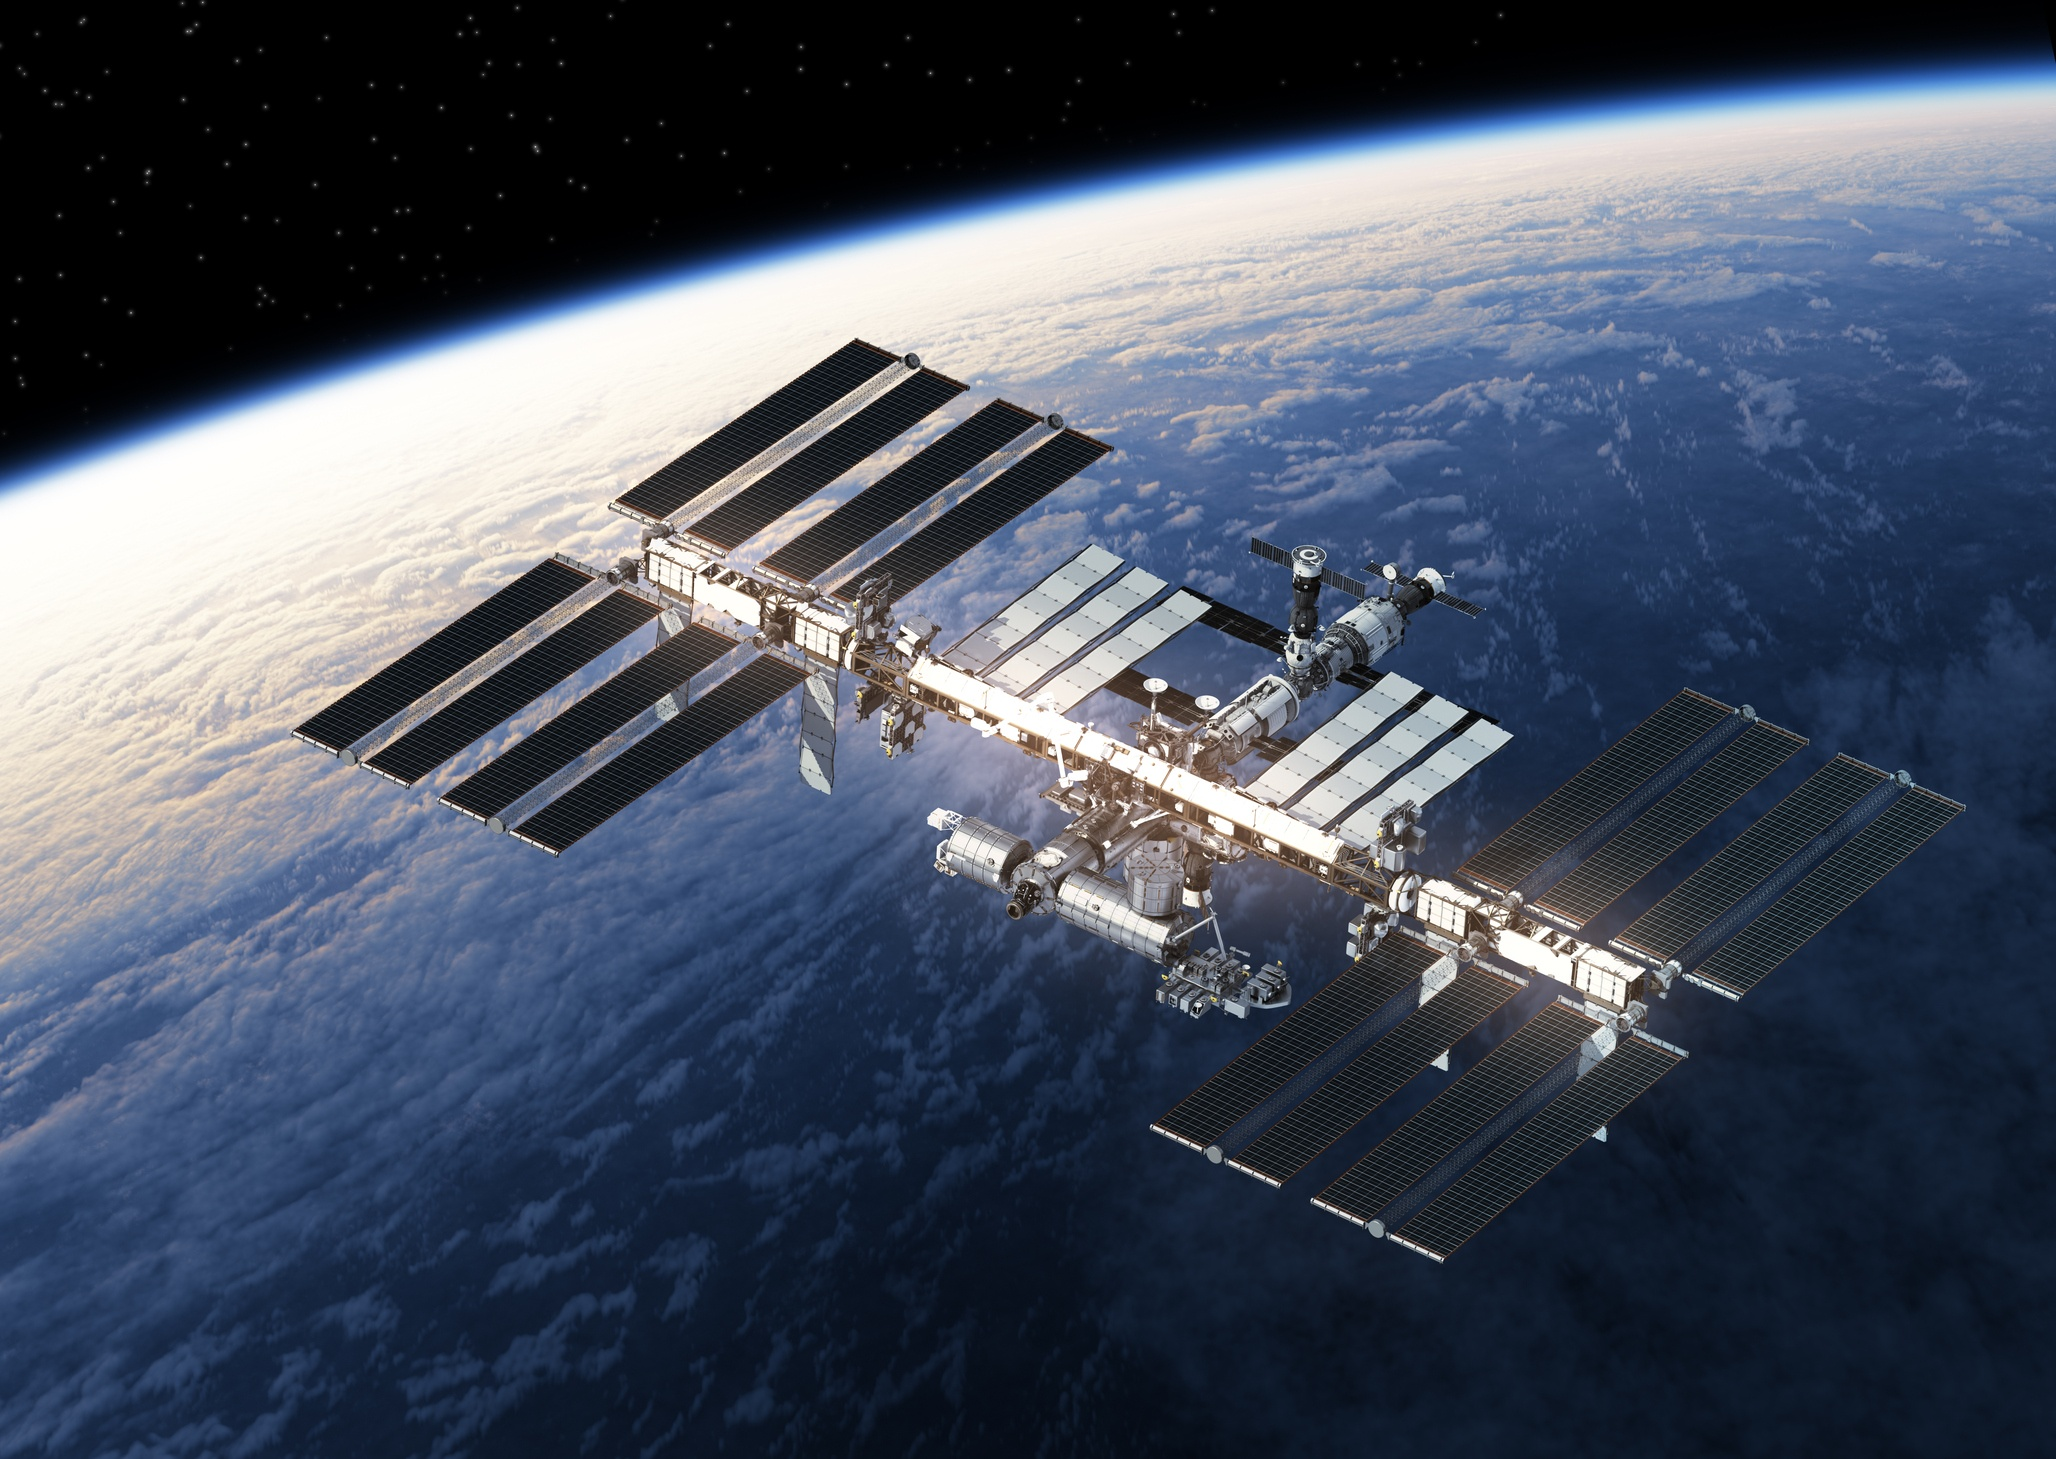 International Space Station orbiting Earth